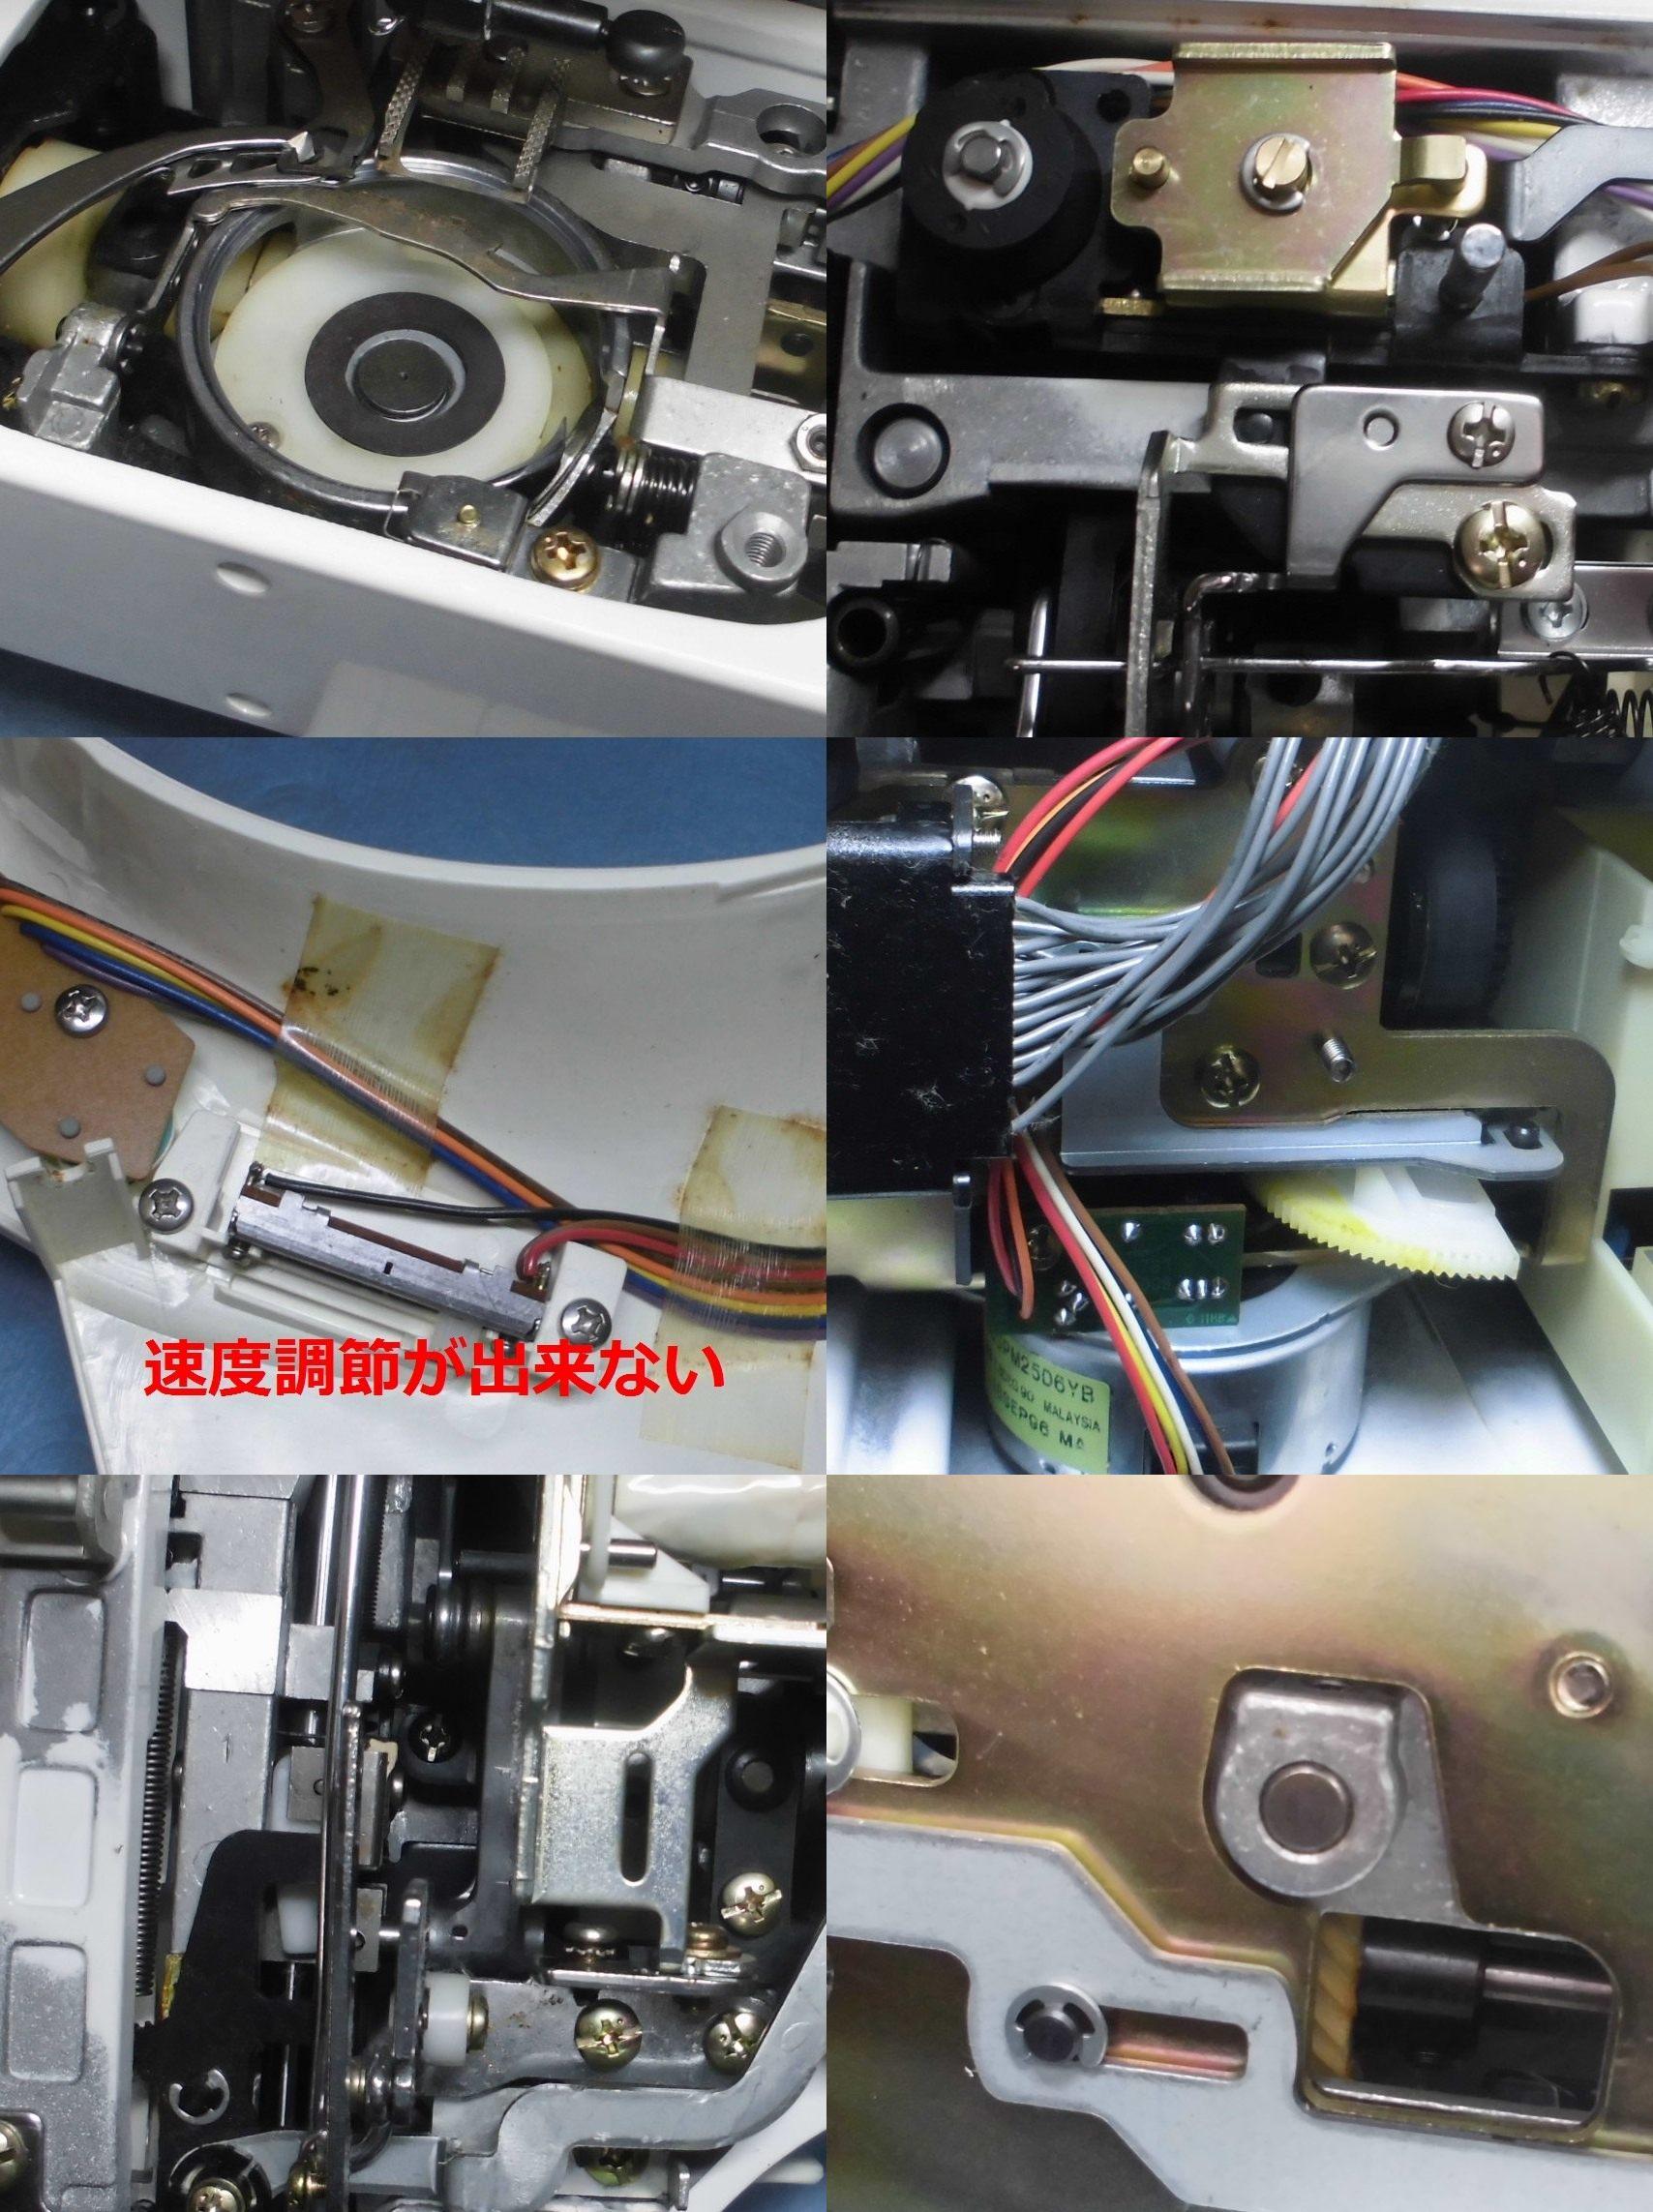 HZL-008Nの故障や不具合|糸調子不良、速度調節が出来ない、異音、針が上下しない